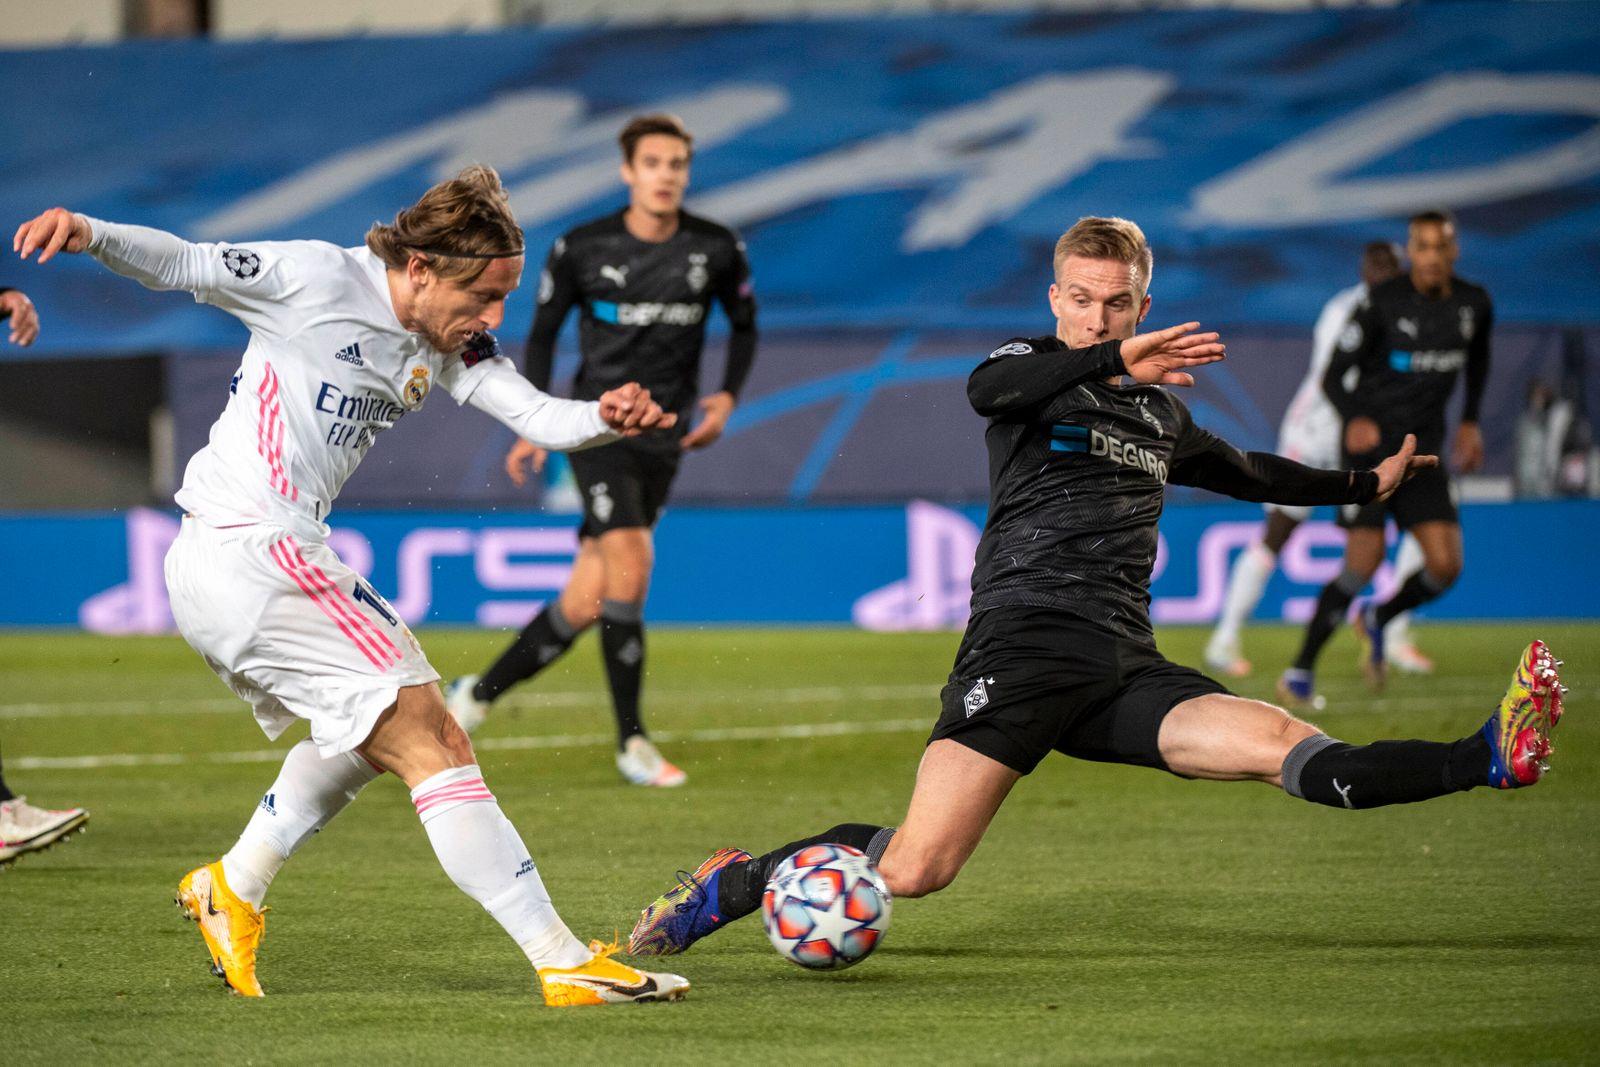 Luka Modric (Real Madrid, 10), Oscar Wendt (Borussia Moenchengladbach 17) GER, Real Madrid vs. Borussia Moenchengladbach